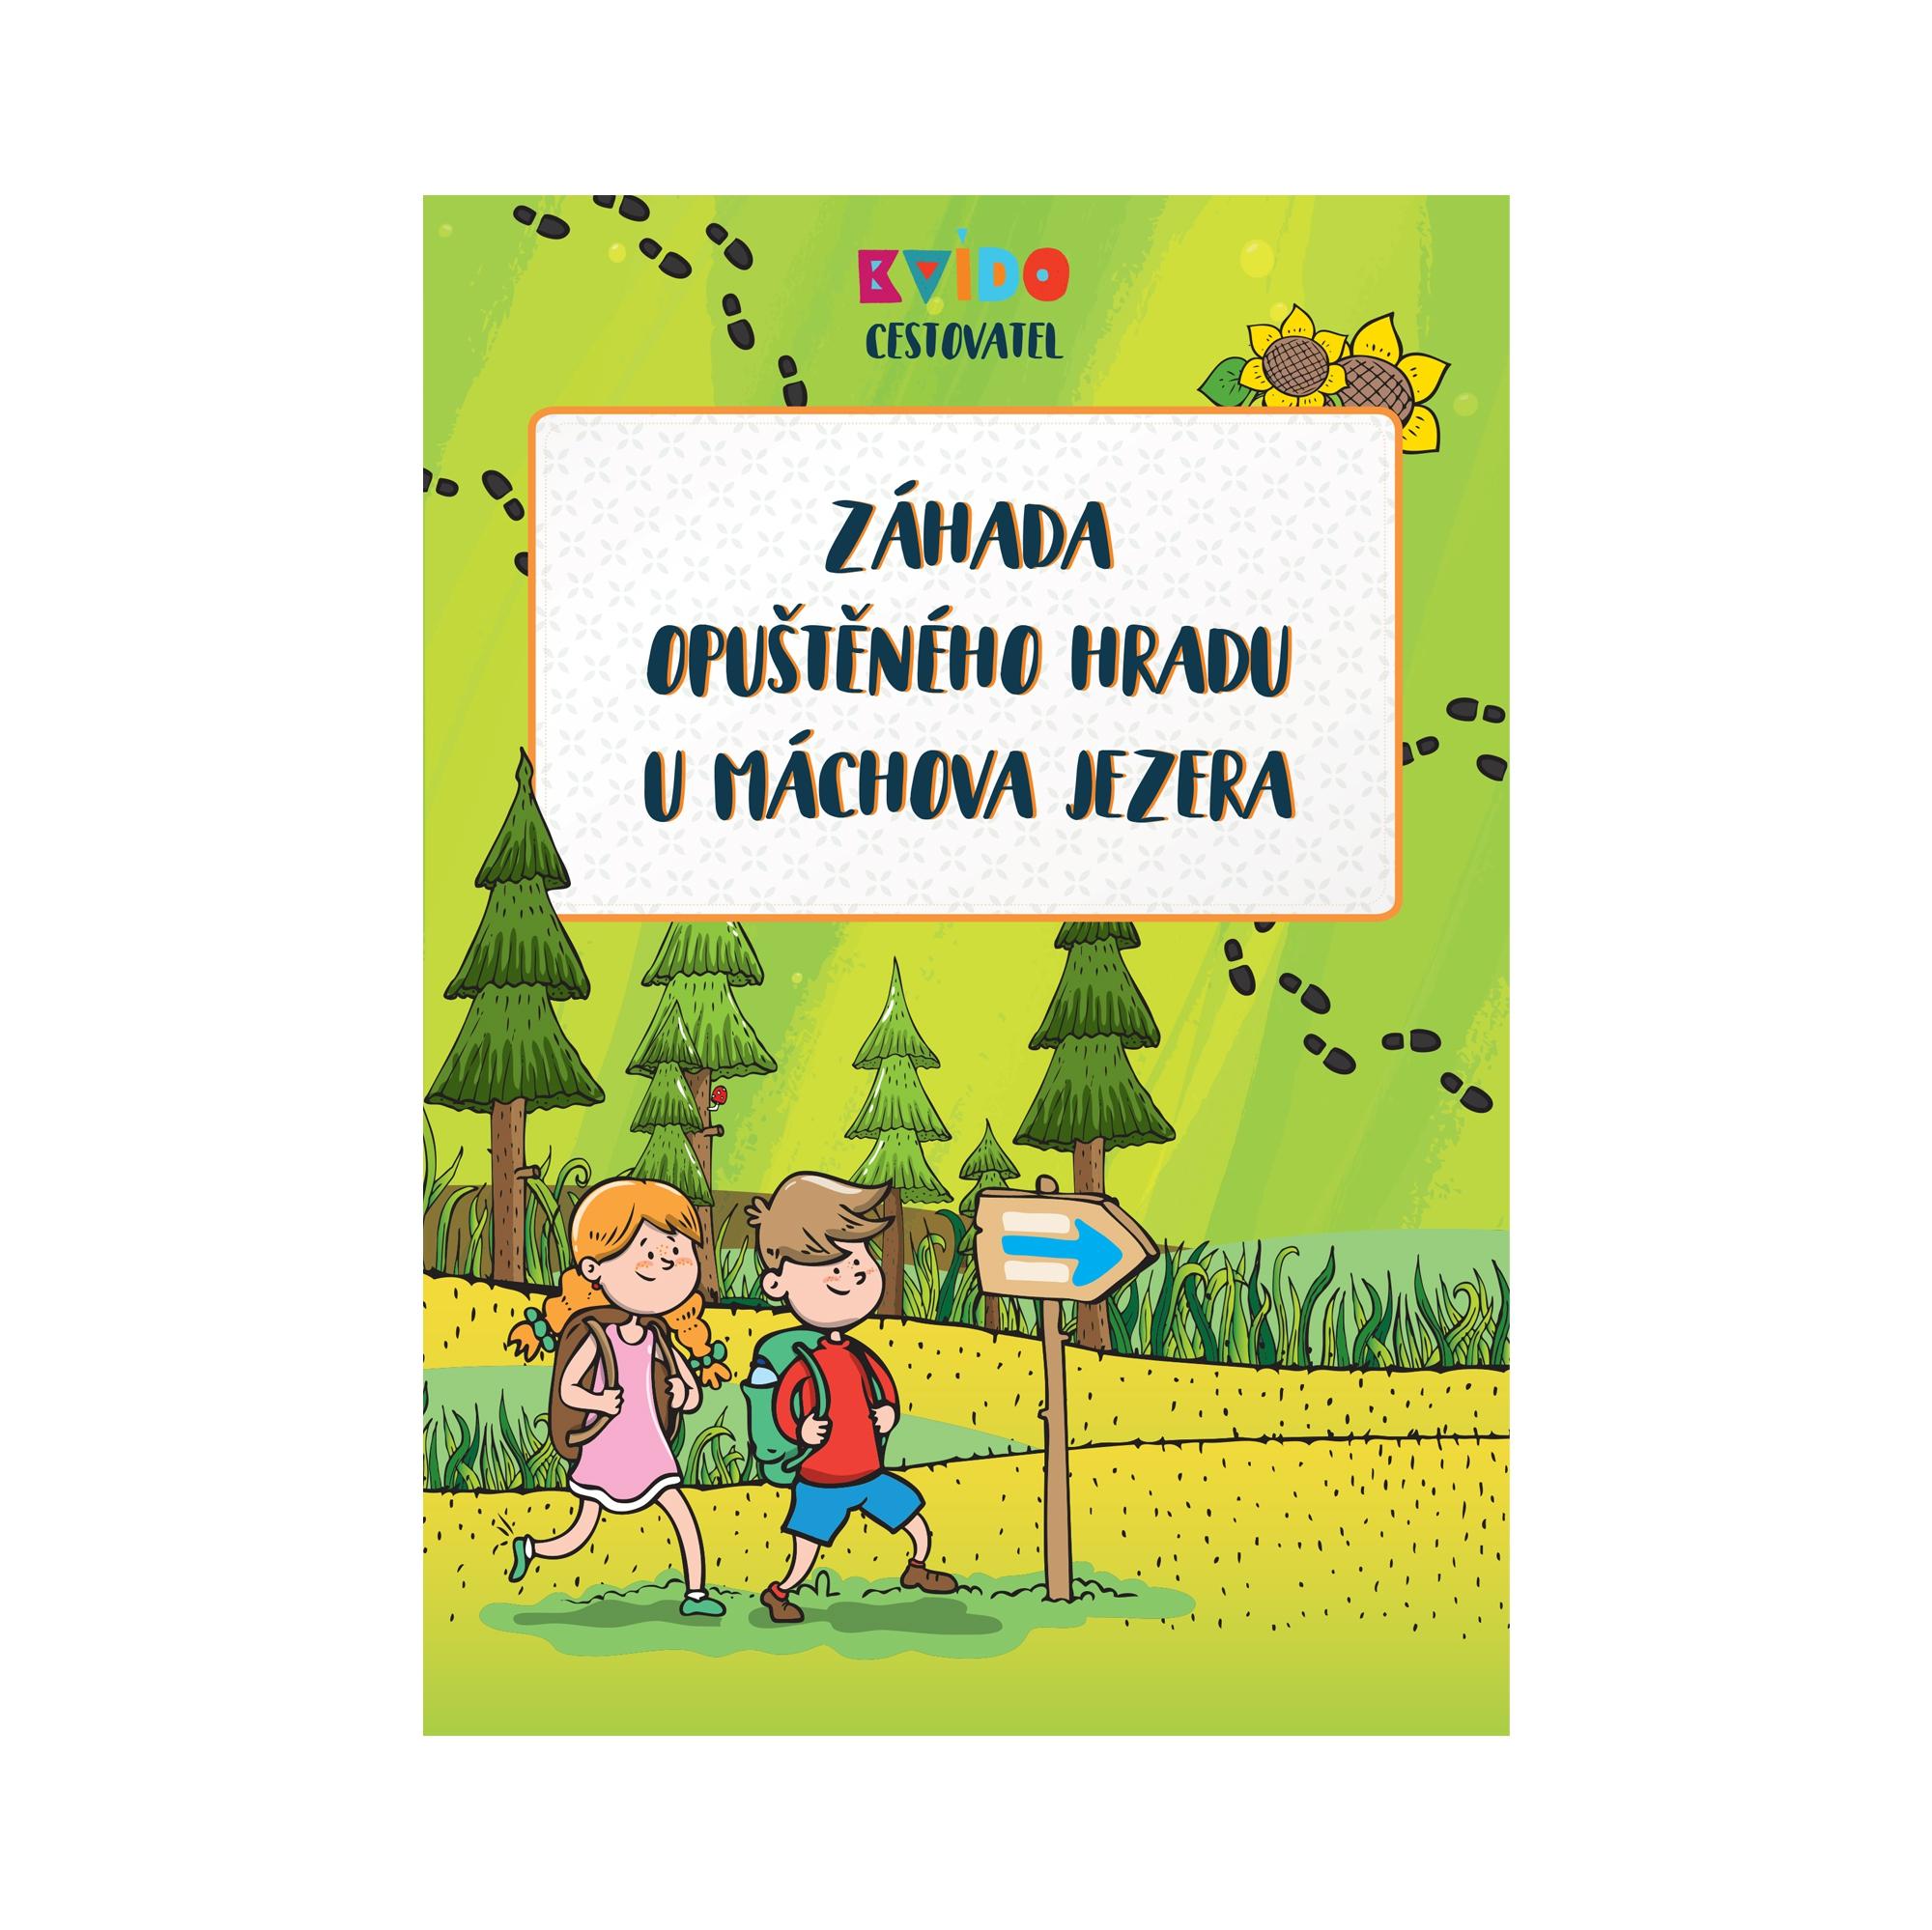 Záhada u Máchova jezera - Kvído